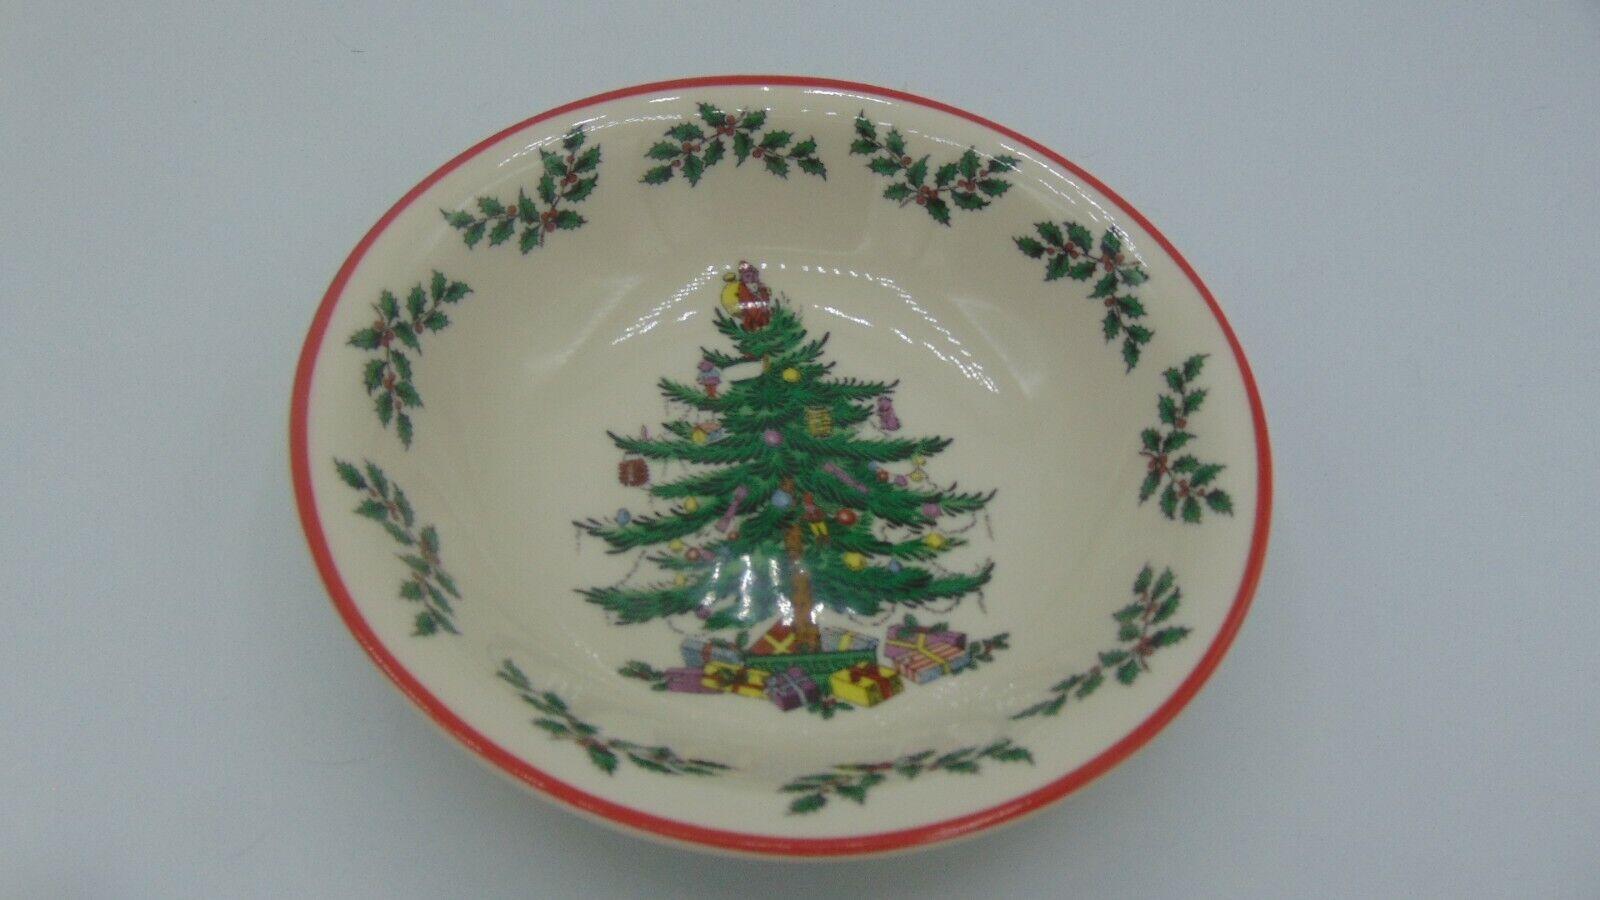 "NWT SPODE CHRISTMAS TREE HOLLY RED TRIM 6.5"" CEREAL OR DESERT BOWLXMAS TREE"